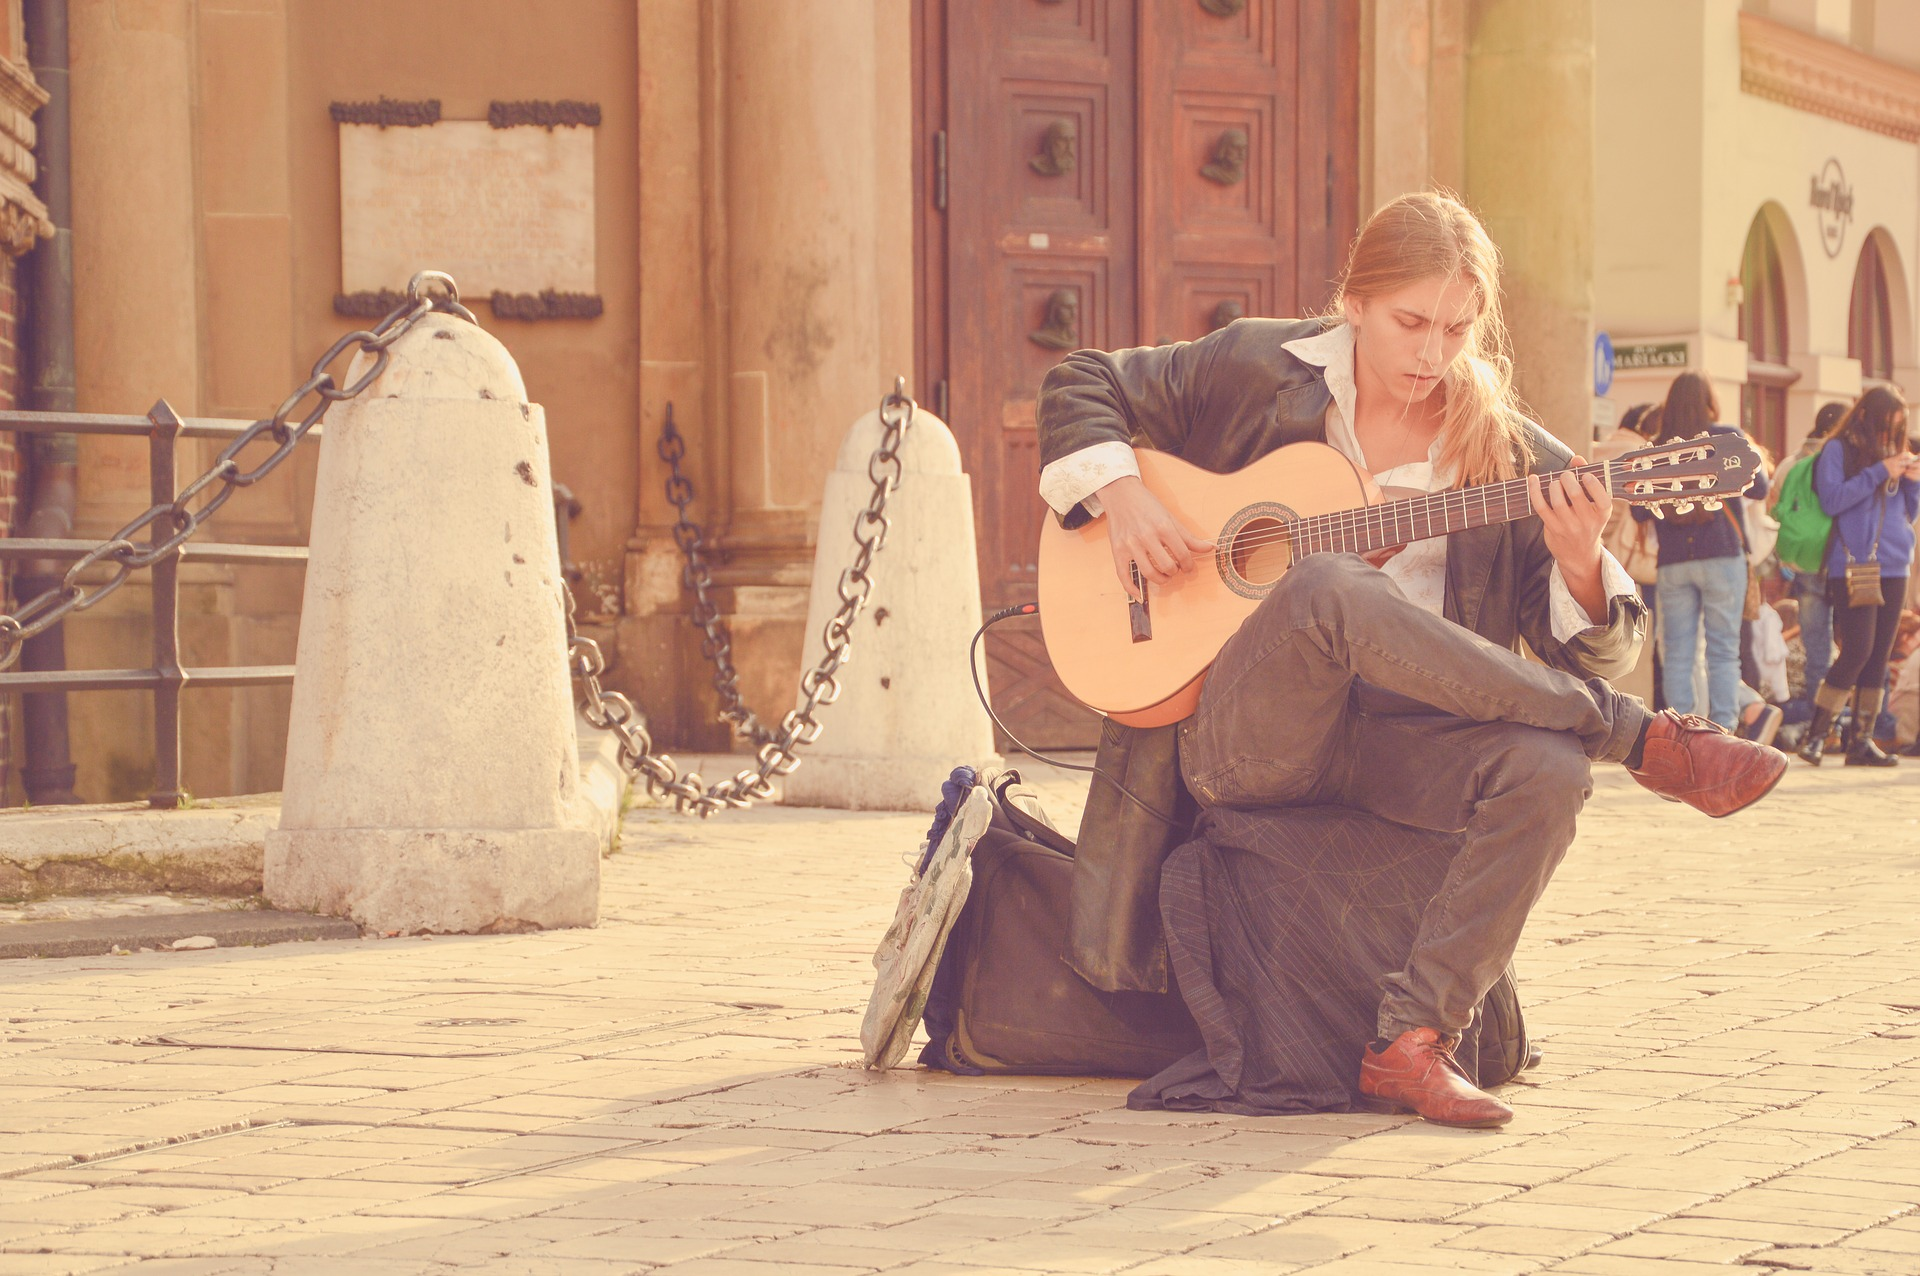 street musicians lviv ukraine